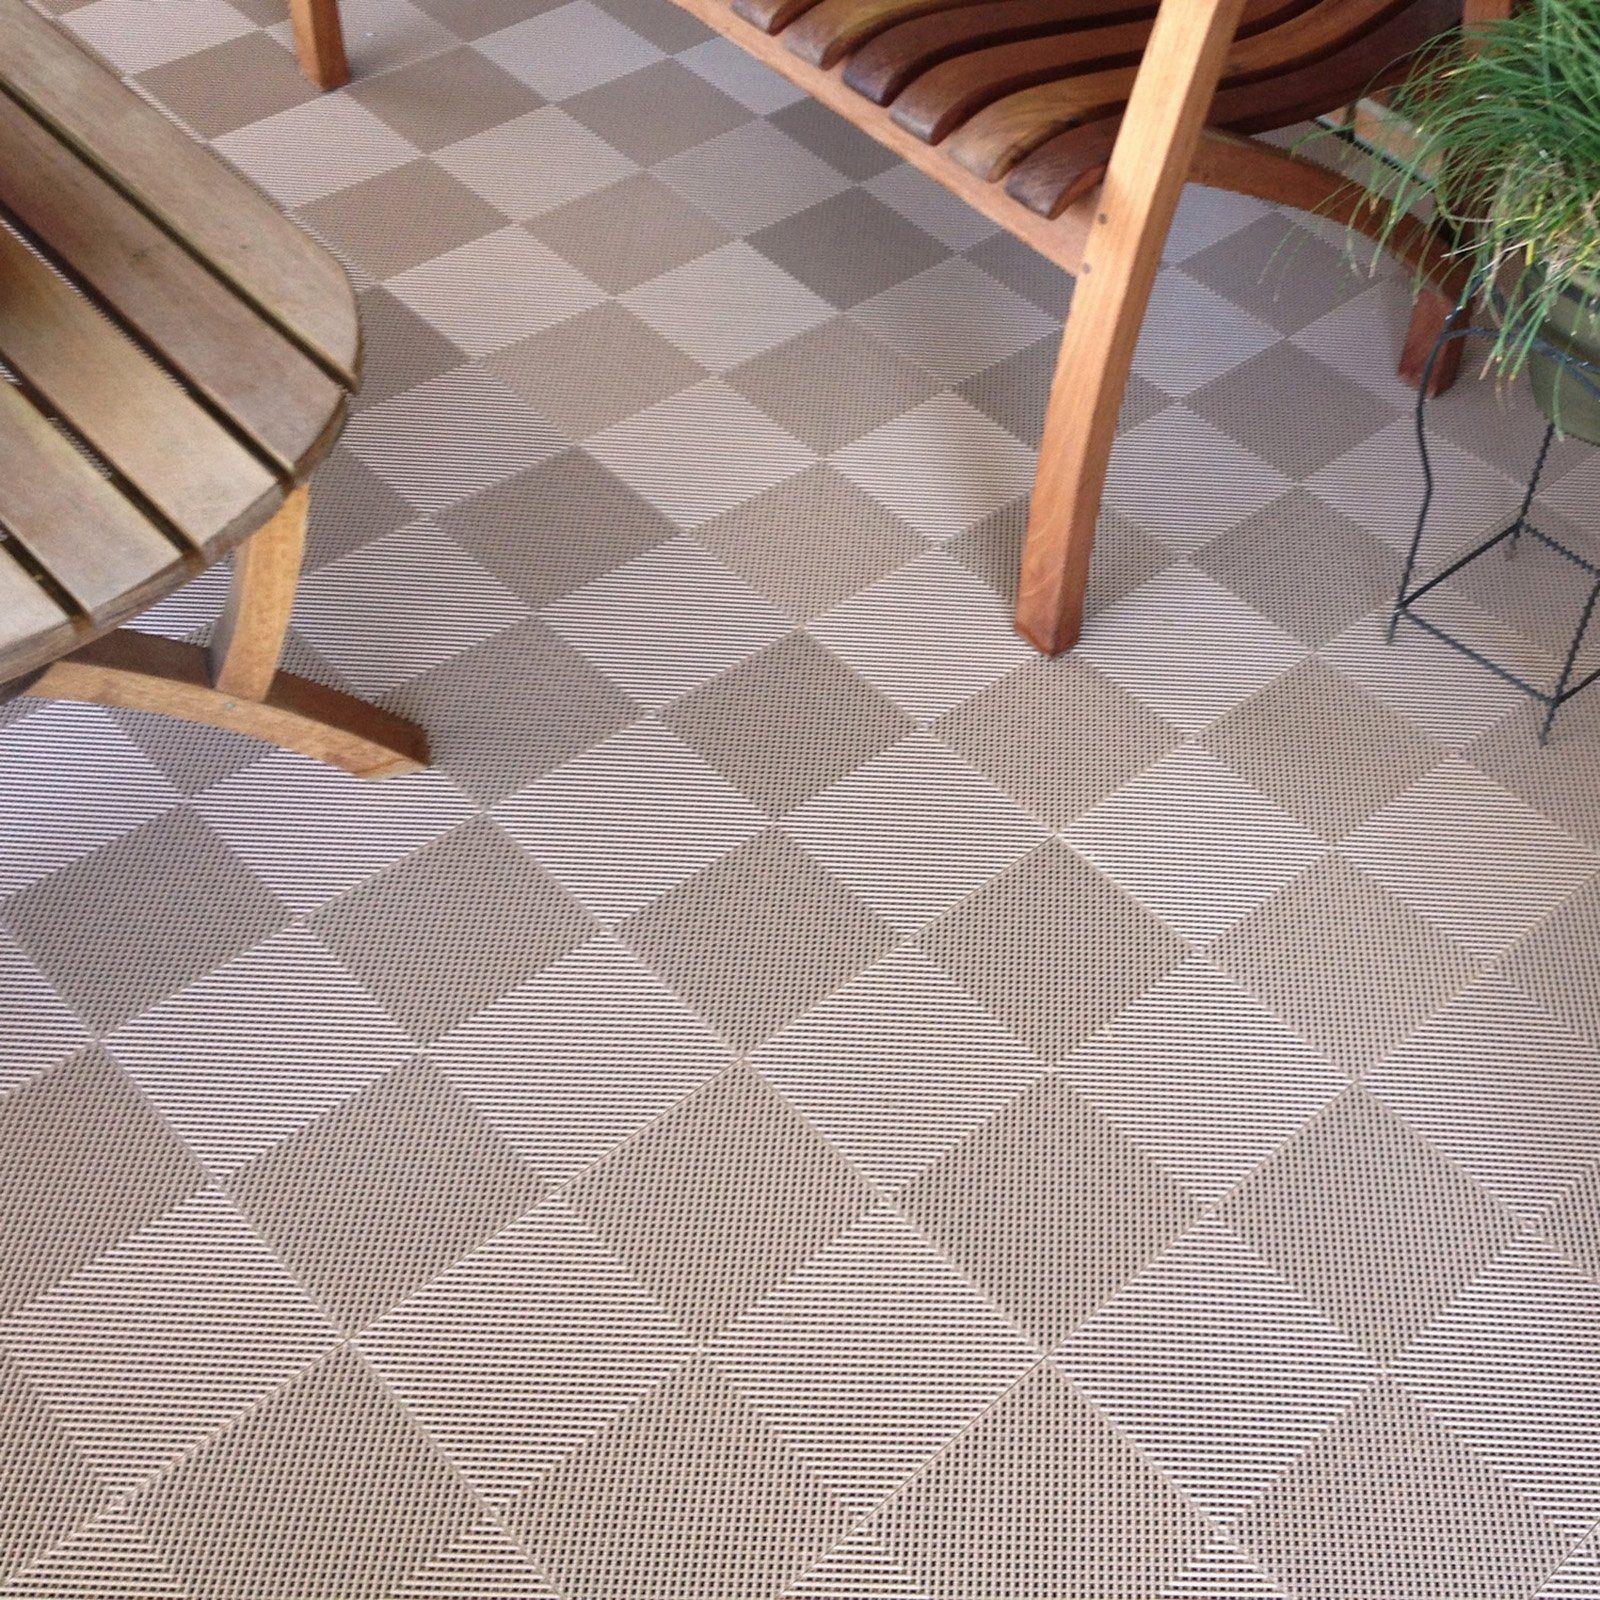 Perforated interlocking floor tiles httpnextsoft21 perforated interlocking floor tiles doublecrazyfo Images